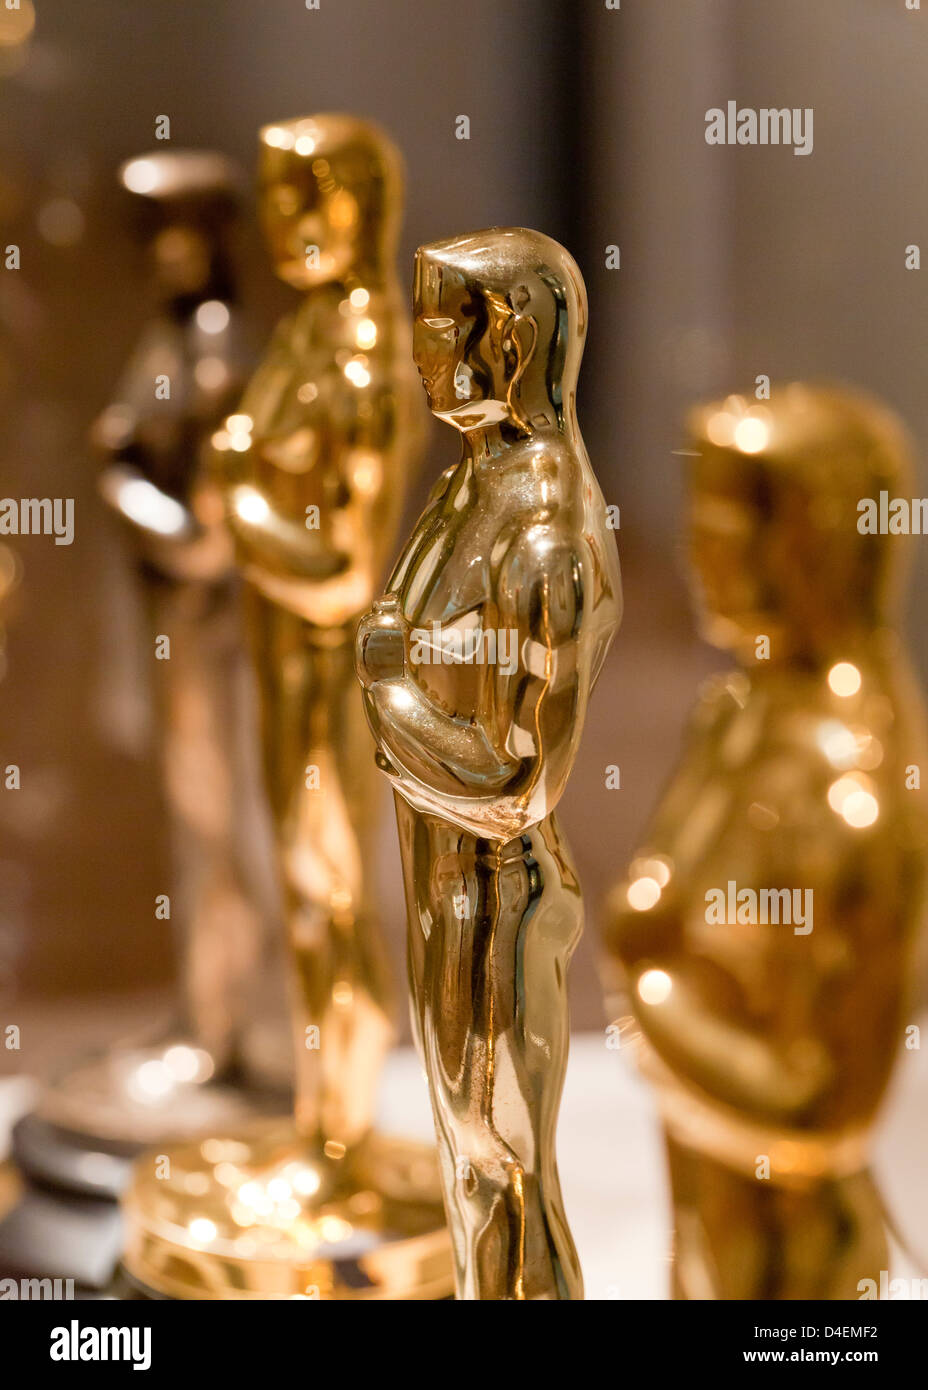 Oscars statuette - Stock Image